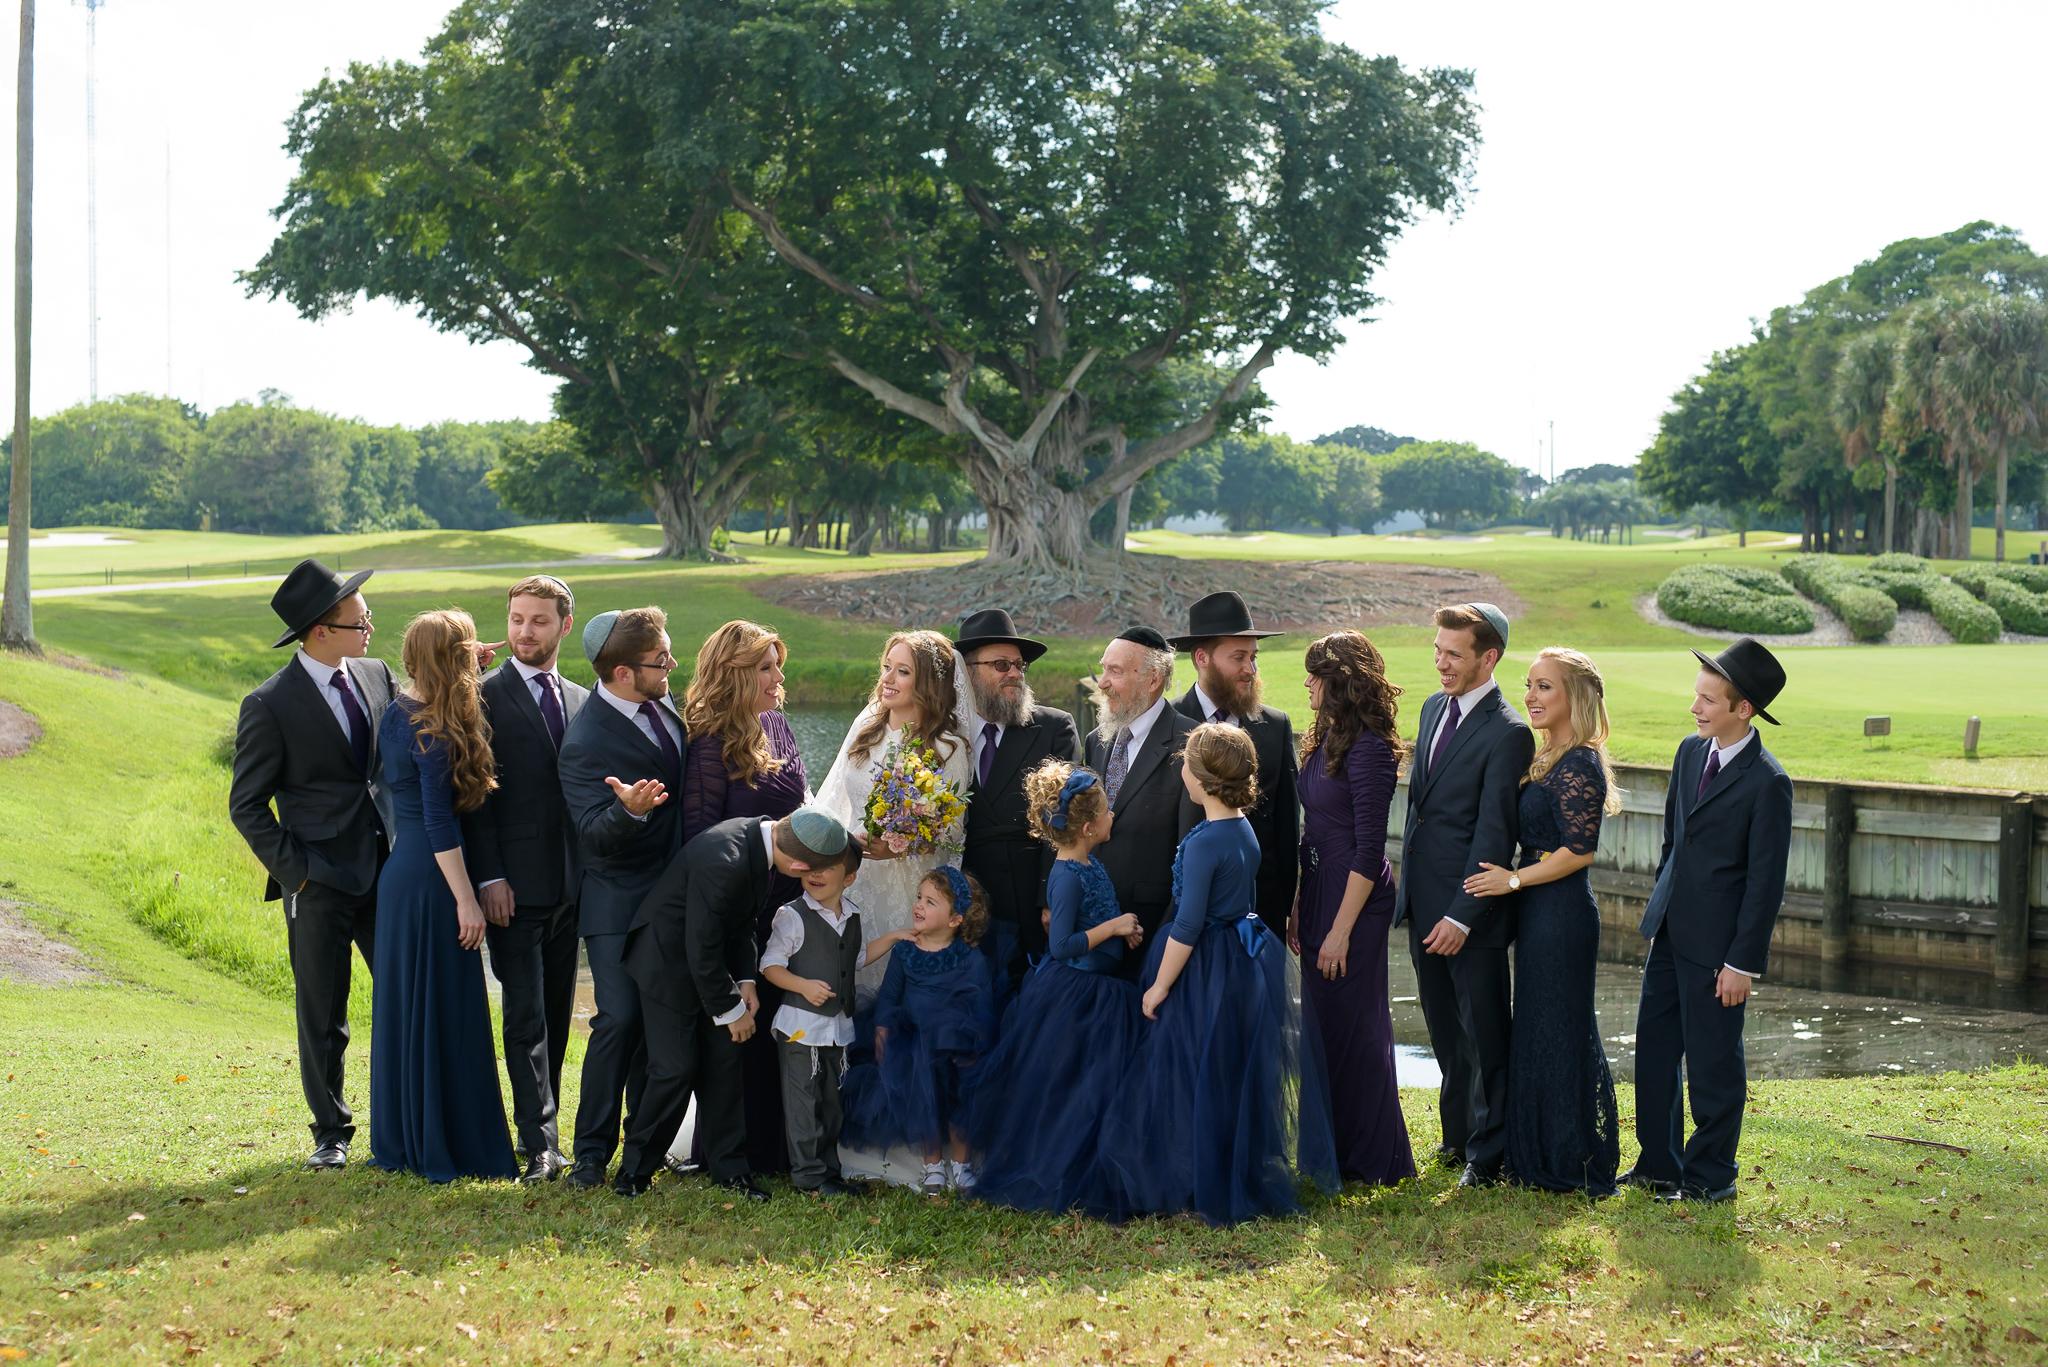 Wedding by Levikfoto.com-017.jpg